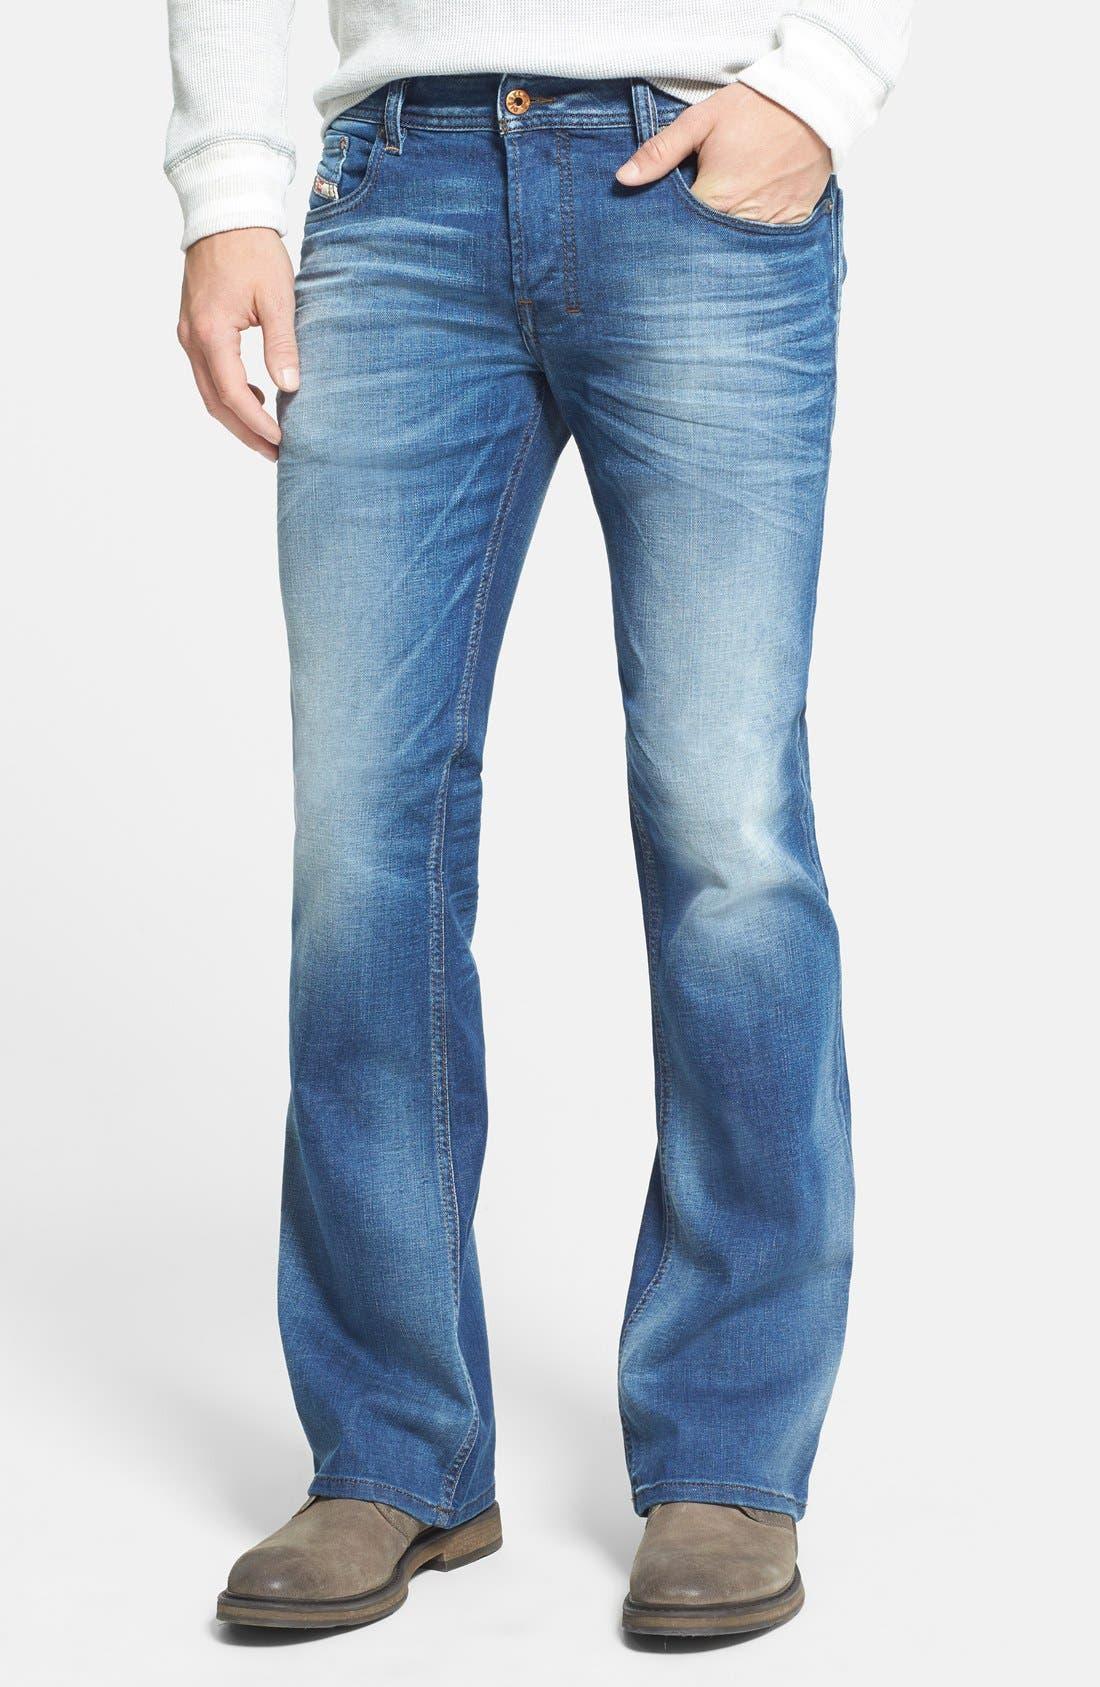 Zathan Bootcut Jeans,                             Main thumbnail 1, color,                             499